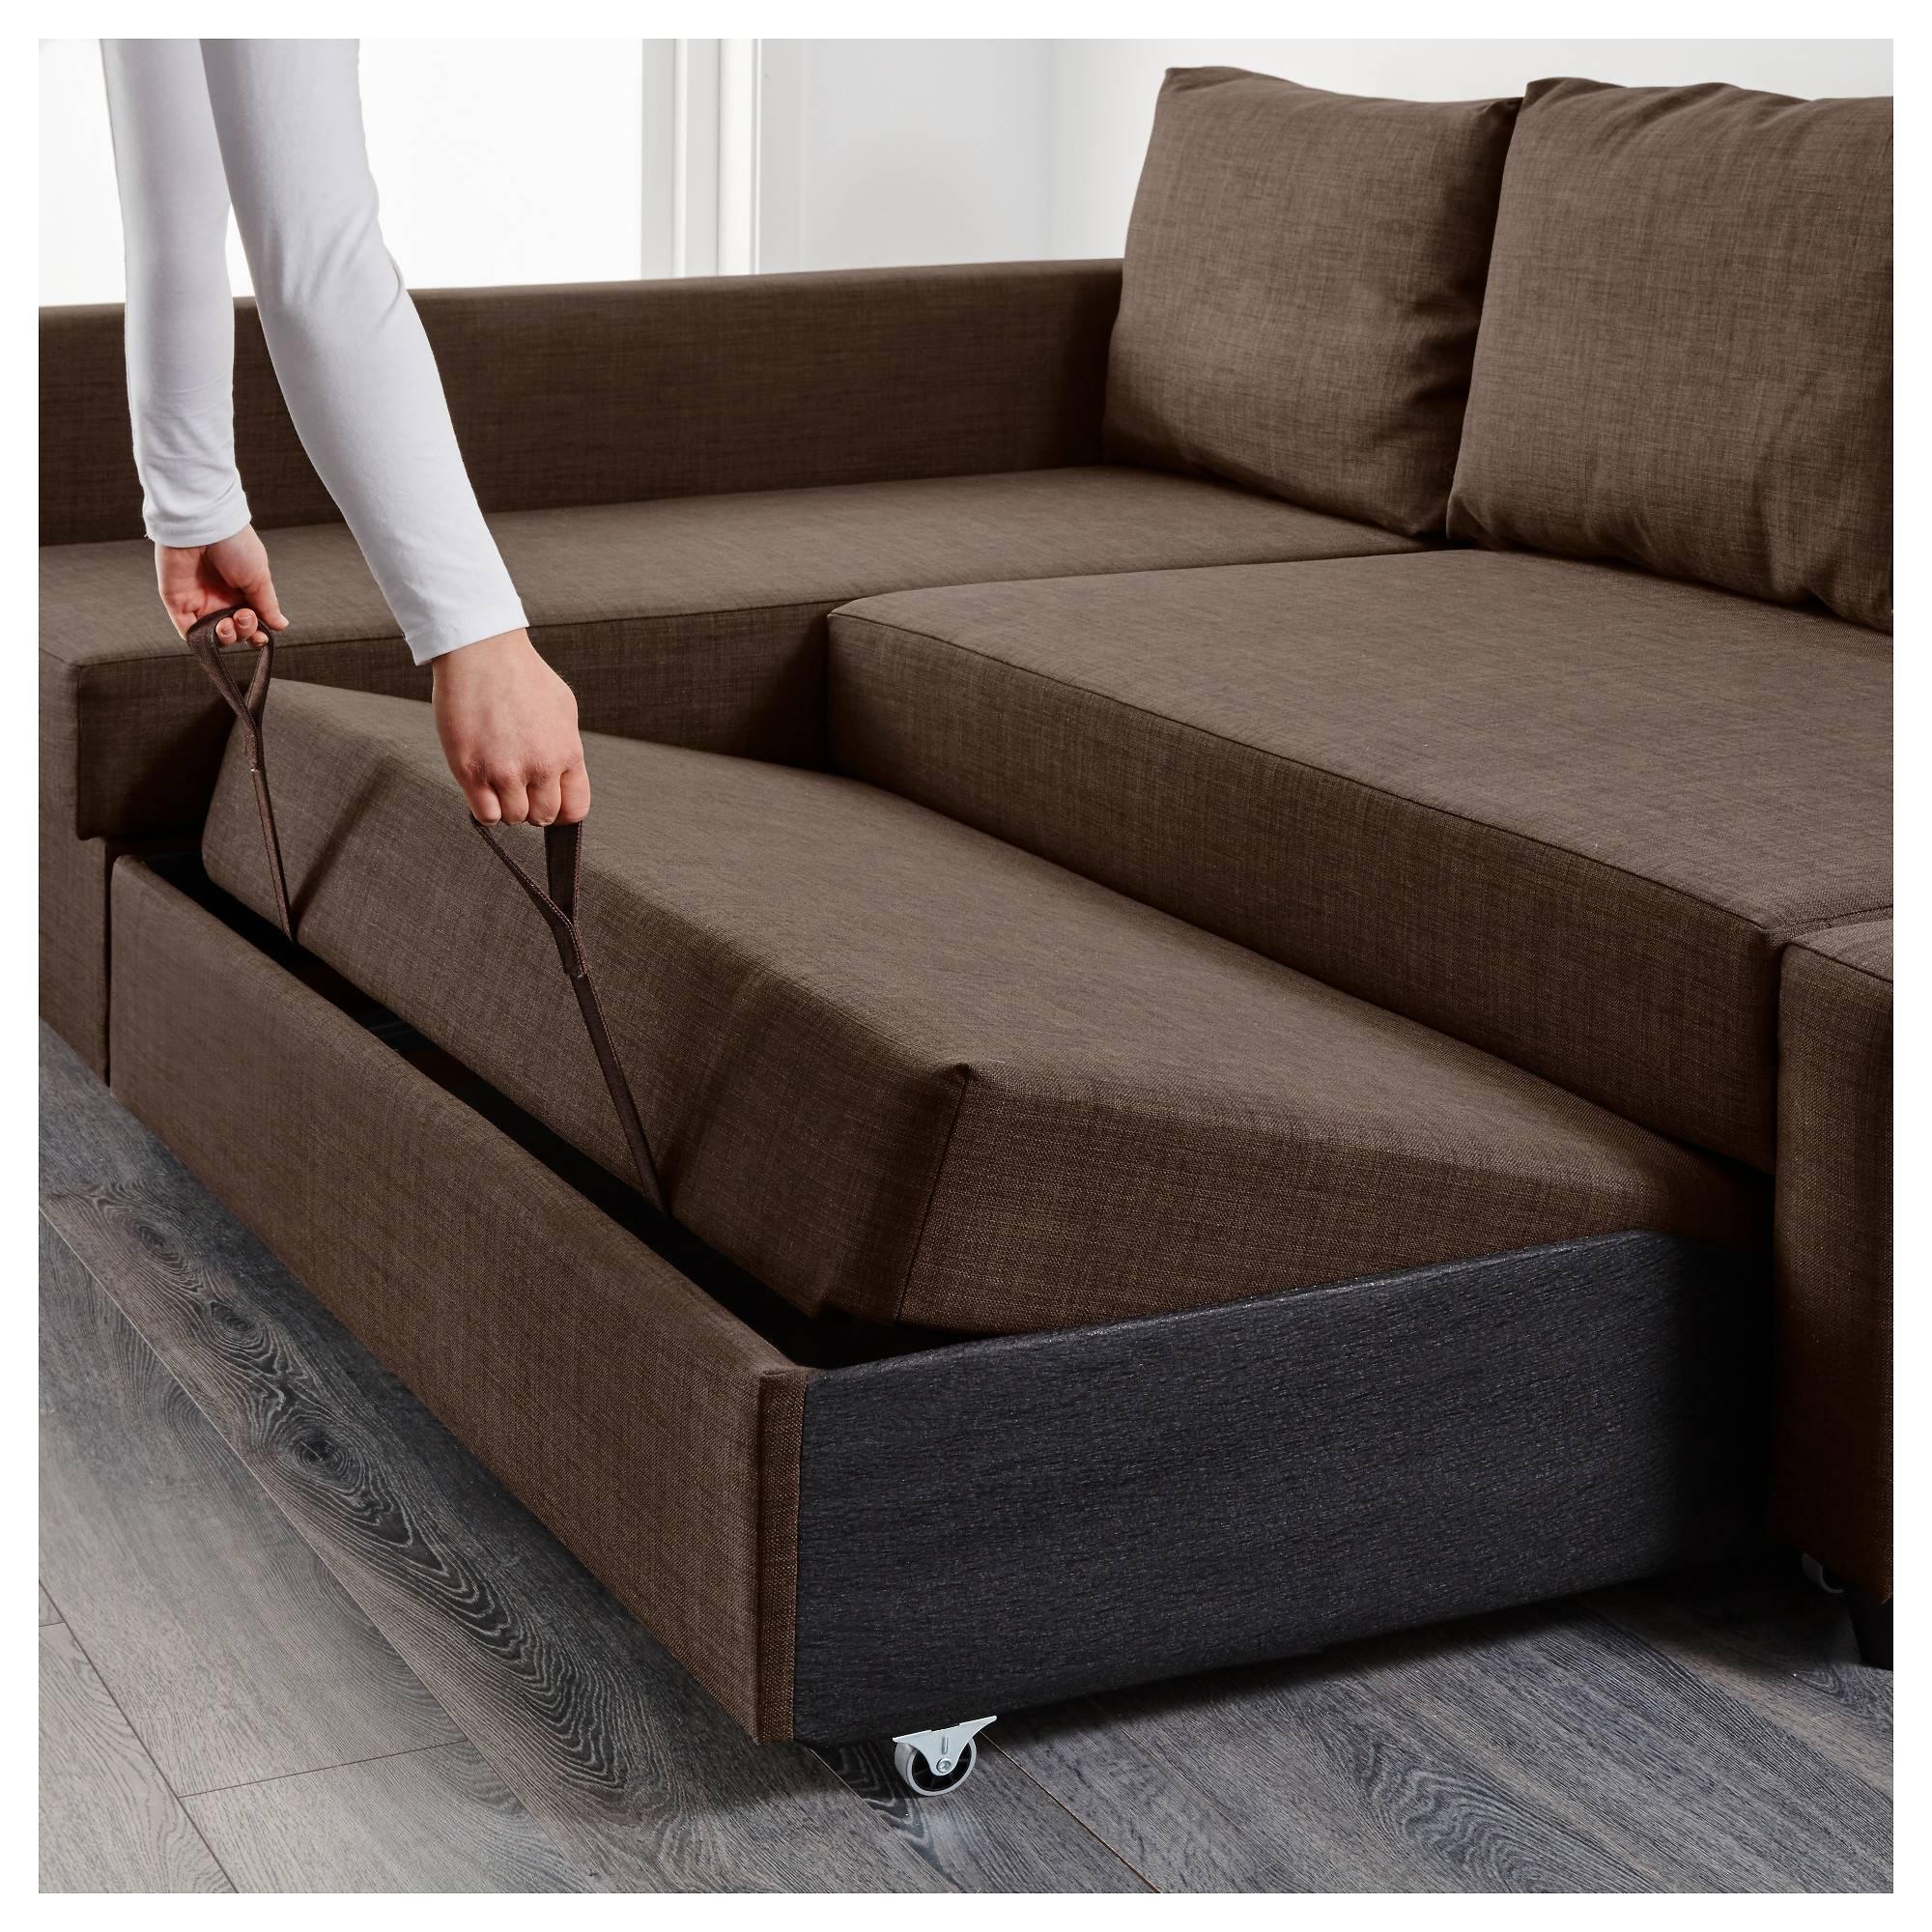 Friheten Sleeper Sectional,3 Seat W/storage - Skiftebo Dark Gray inside Ikea Sleeper Sofa Sectional (Image 5 of 25)